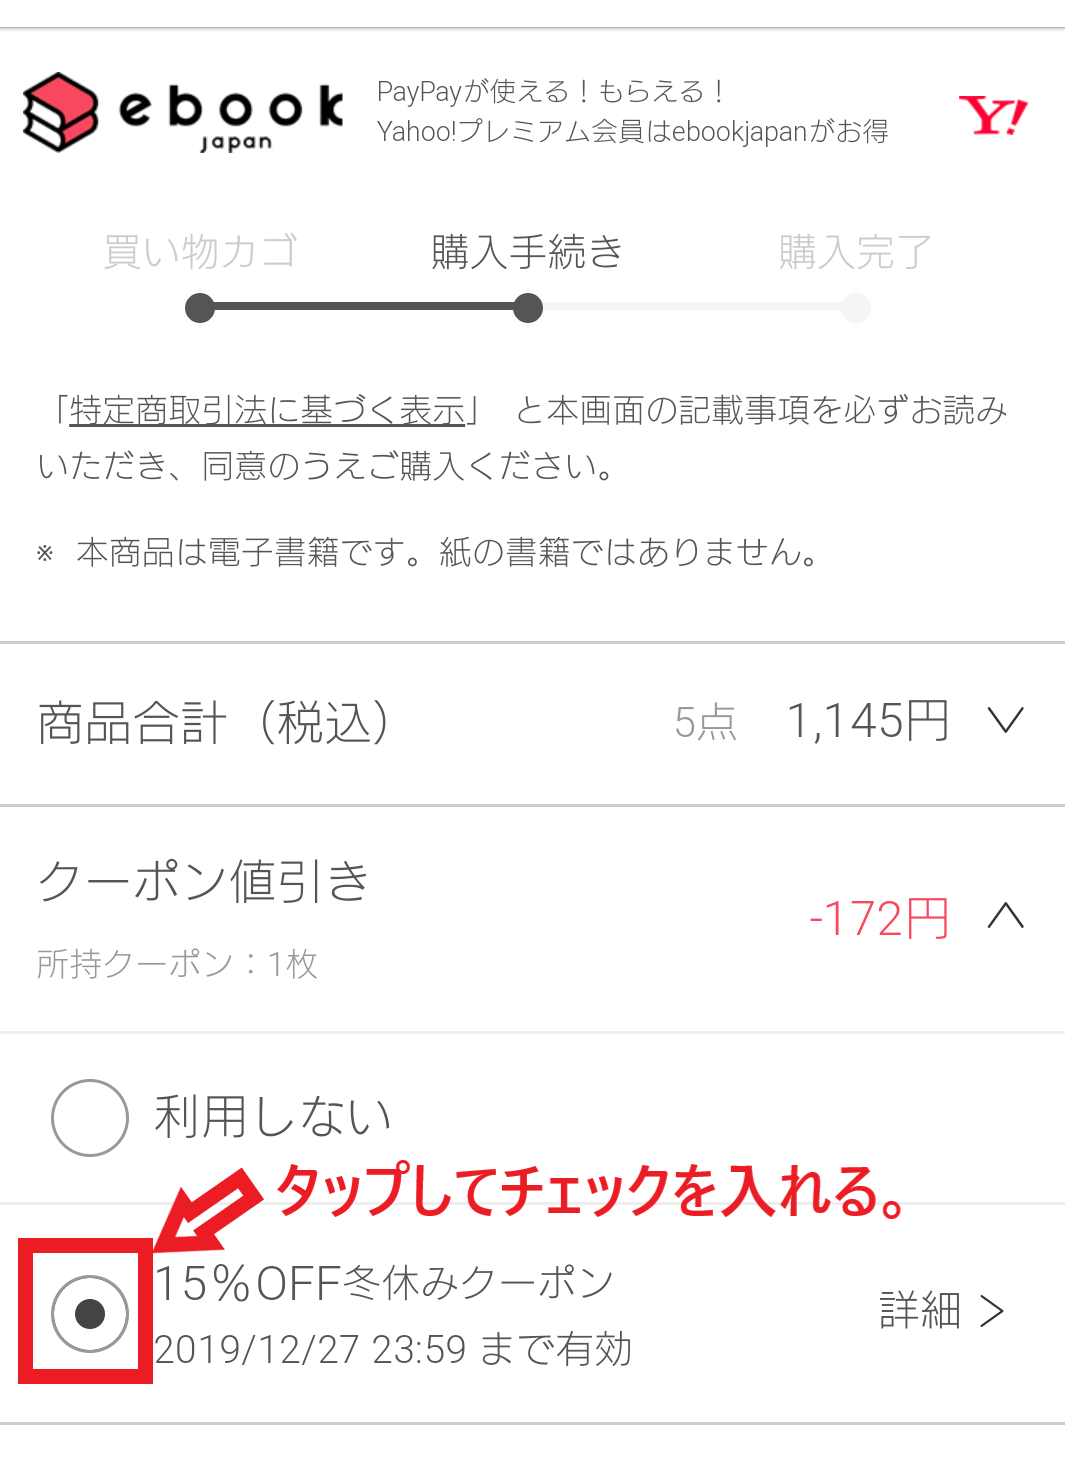 ebookjapan購入例③クーポン